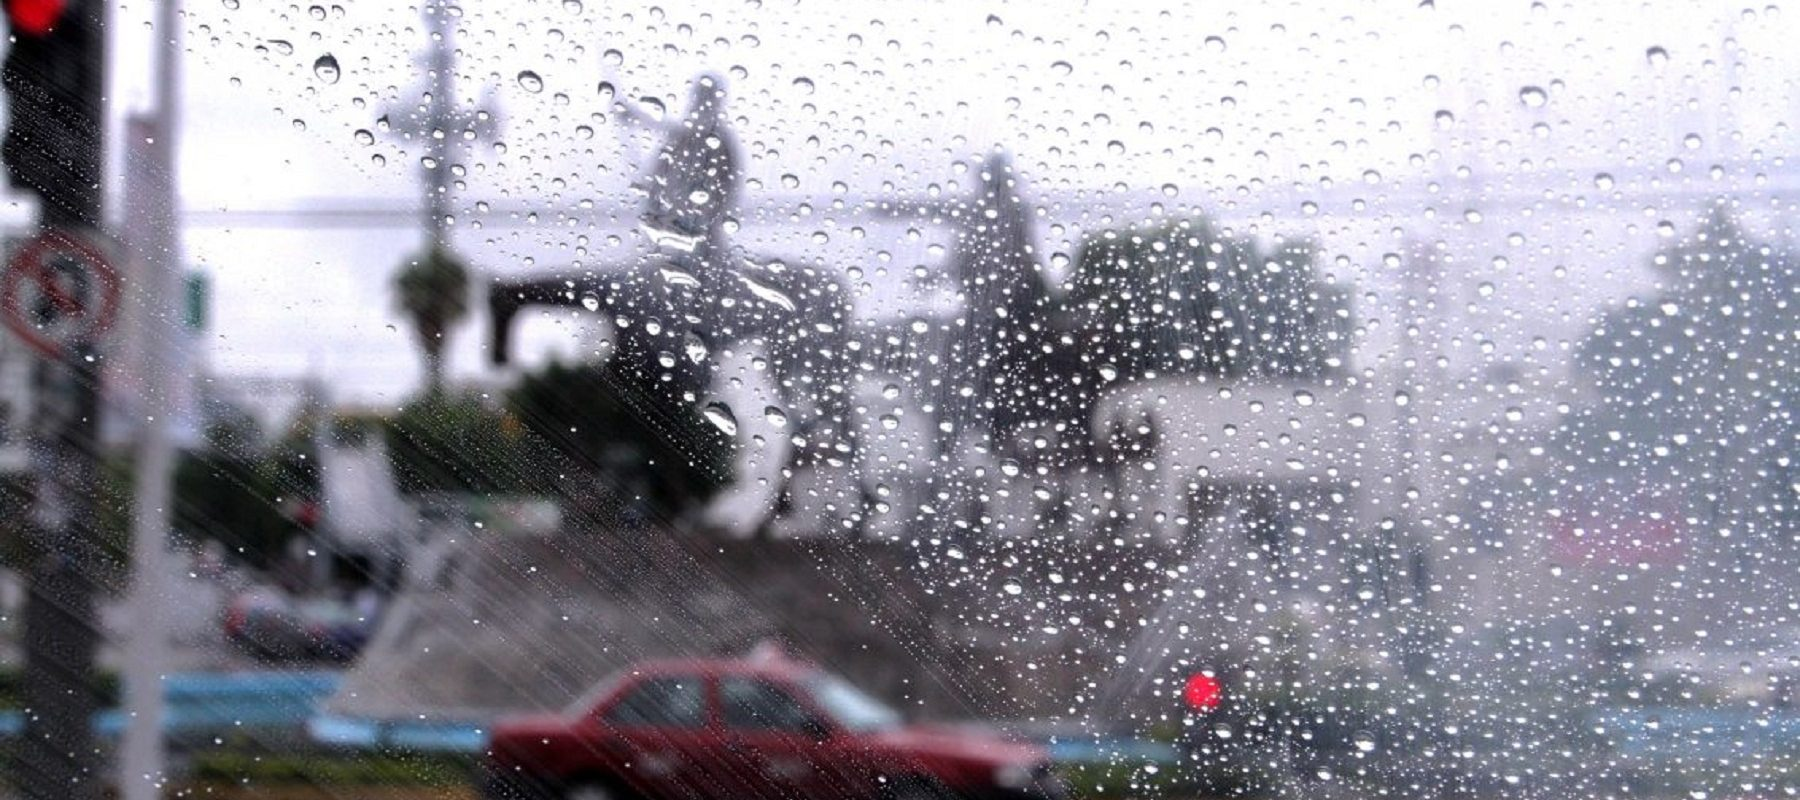 Clima en Monclova hoy 3 de marzo: heladas matutinas y lluvias con descargas eléctricas